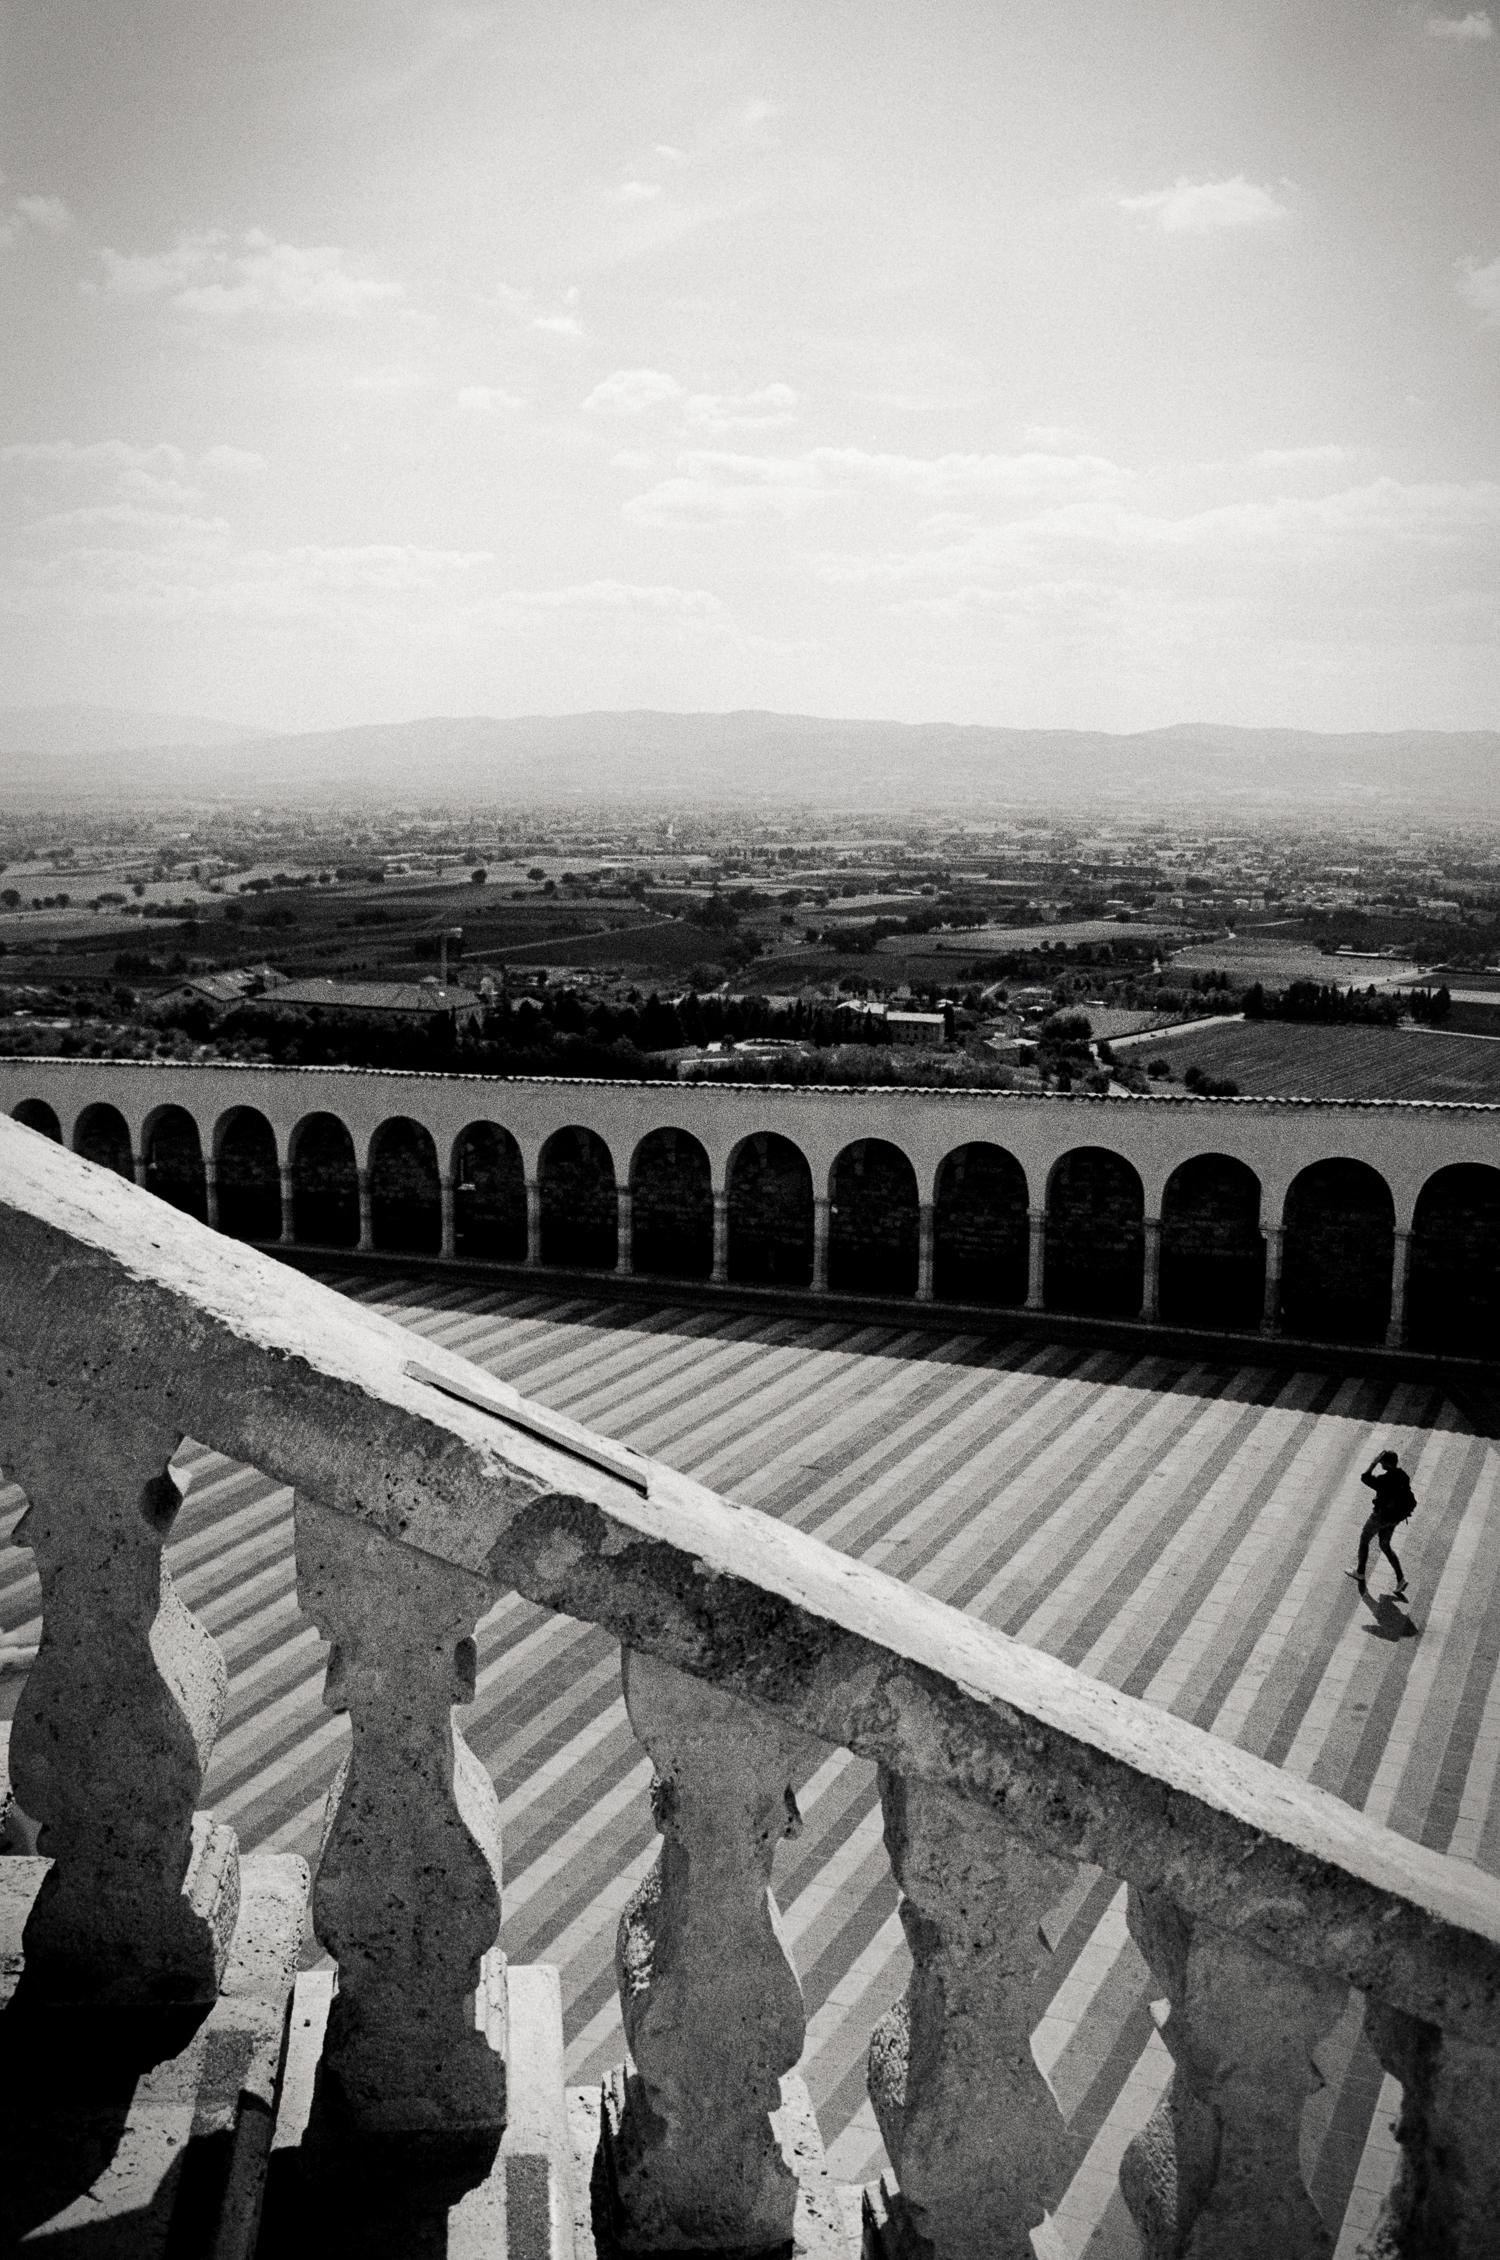 Basilica of Saint Francis, Assisi, Italy 2001.